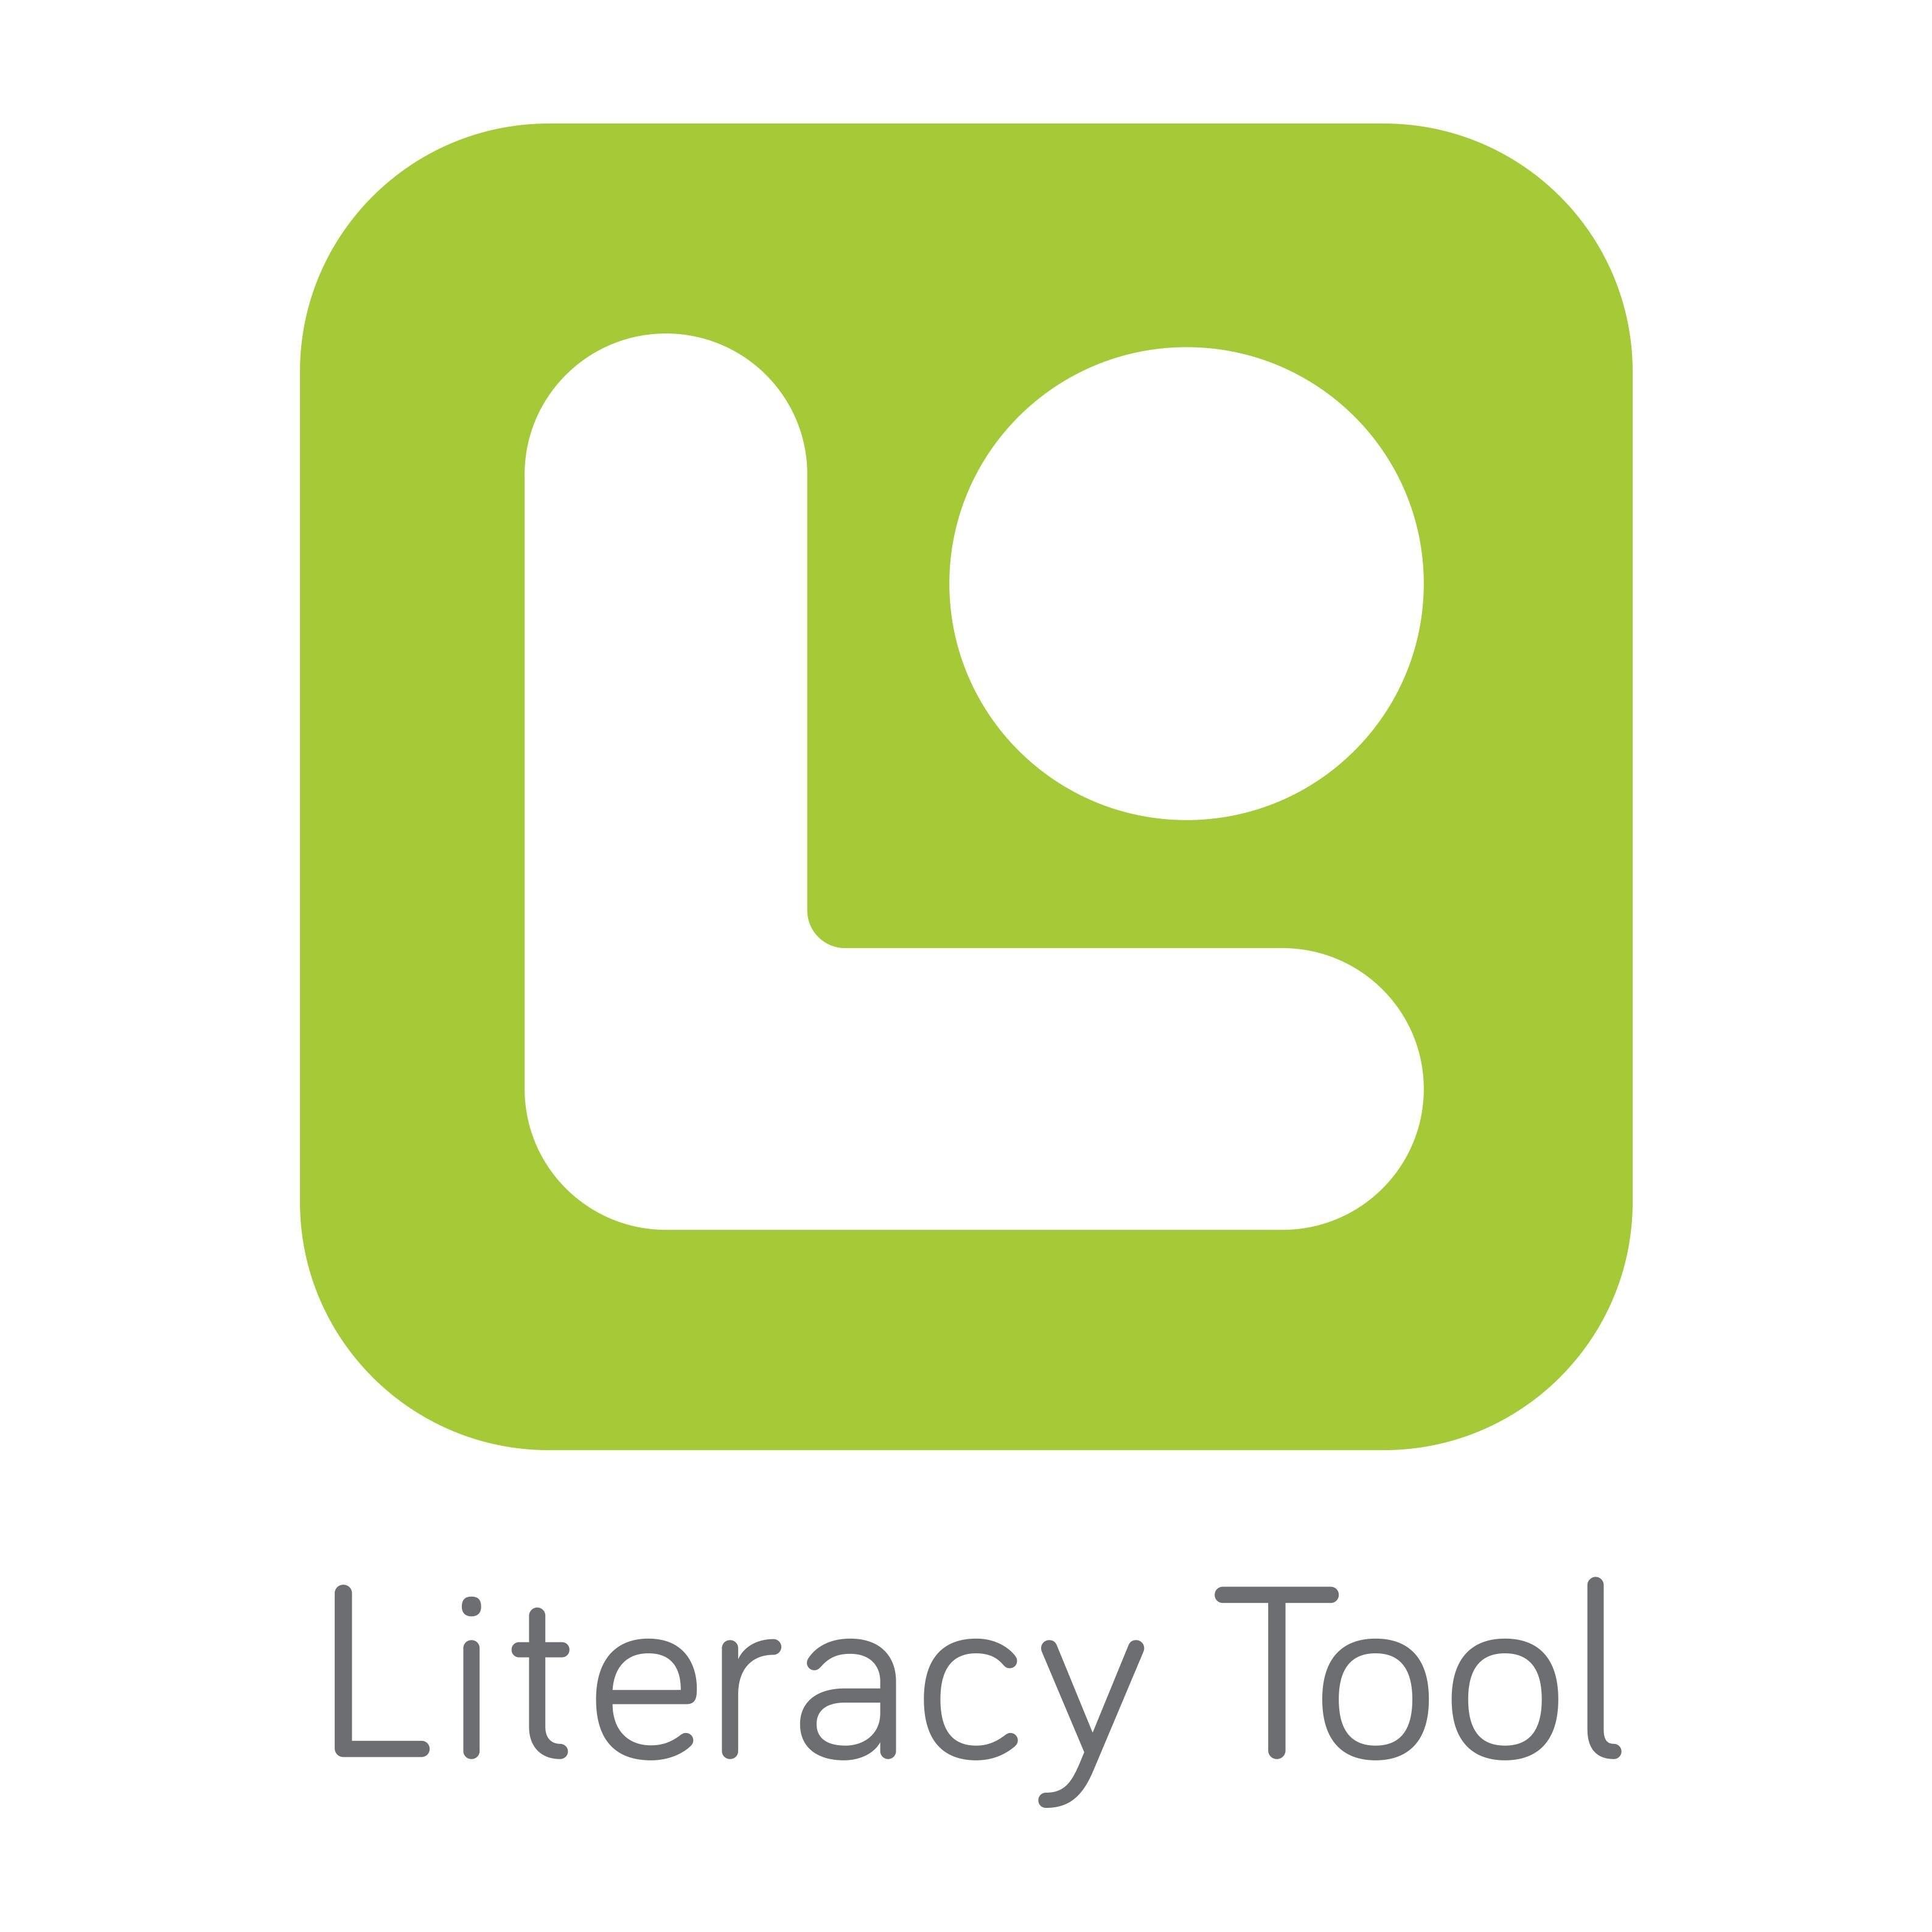 The Literacy Tool